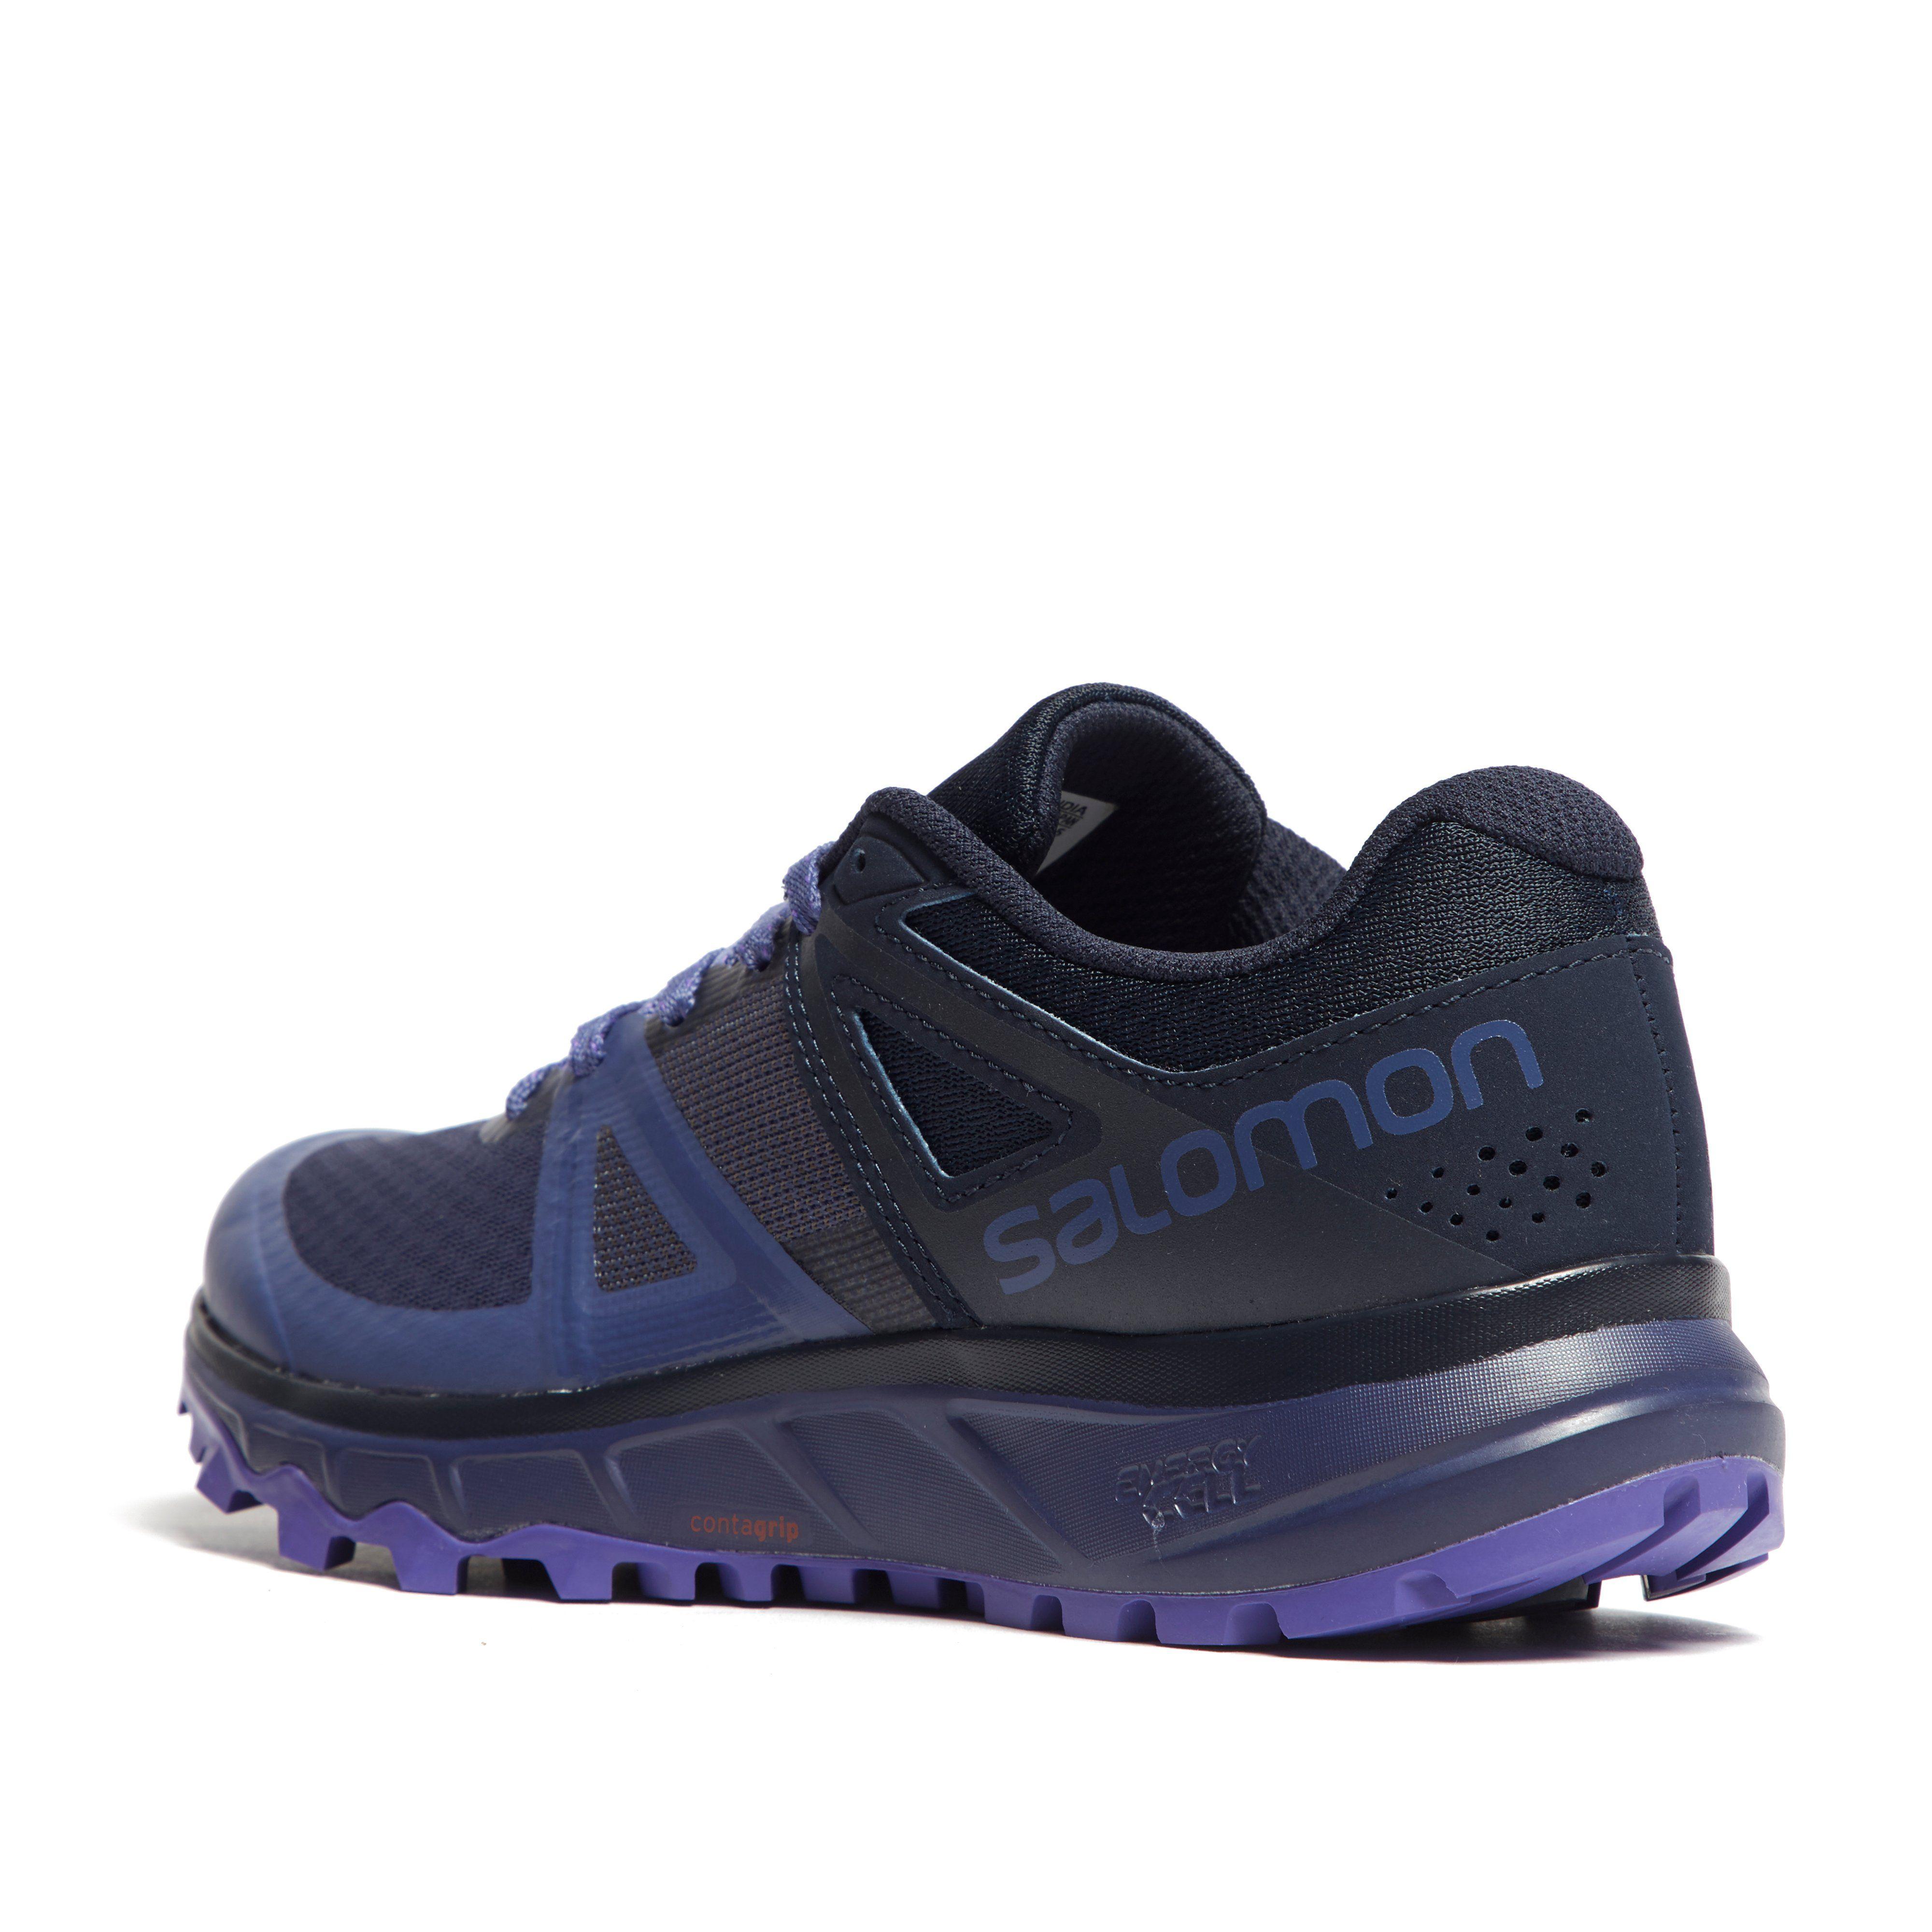 Salomon Trailster Women's Trail Running Shoes